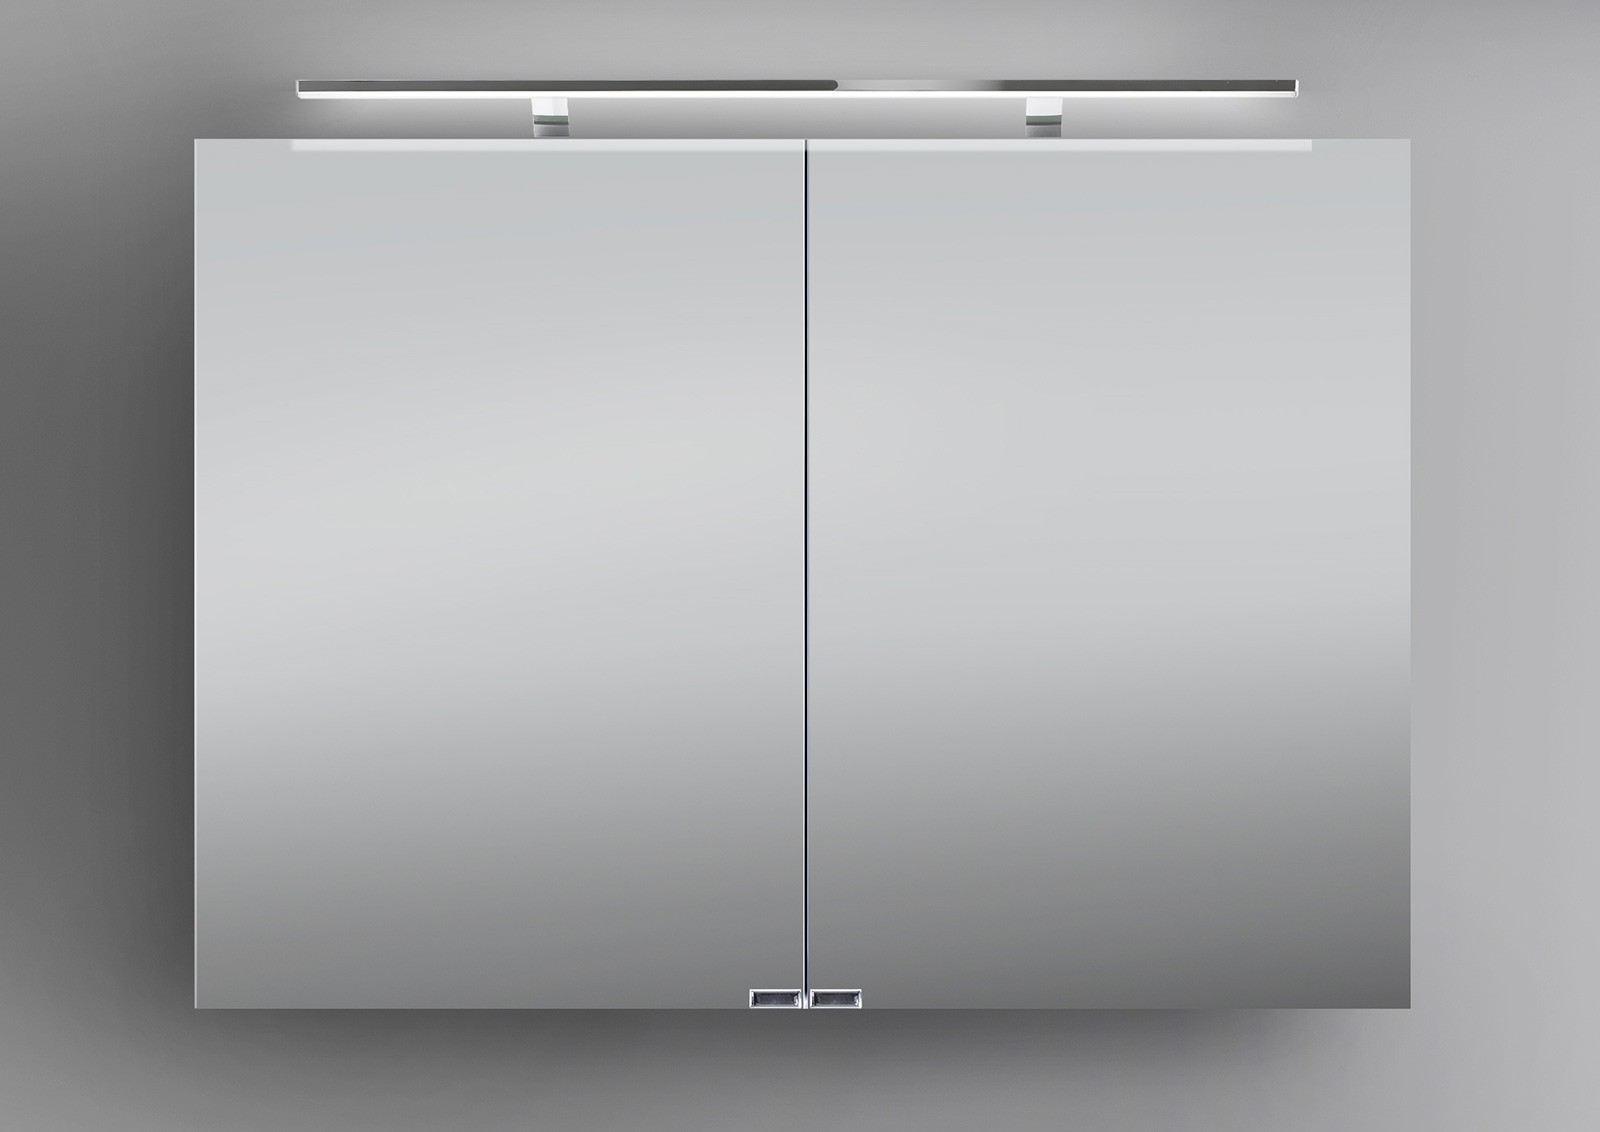 Spiegelschrank bad 100 cm led beleuchtung doppelseitig verspiegelt 5201 - Spiegelschrank bad 100 cm ...